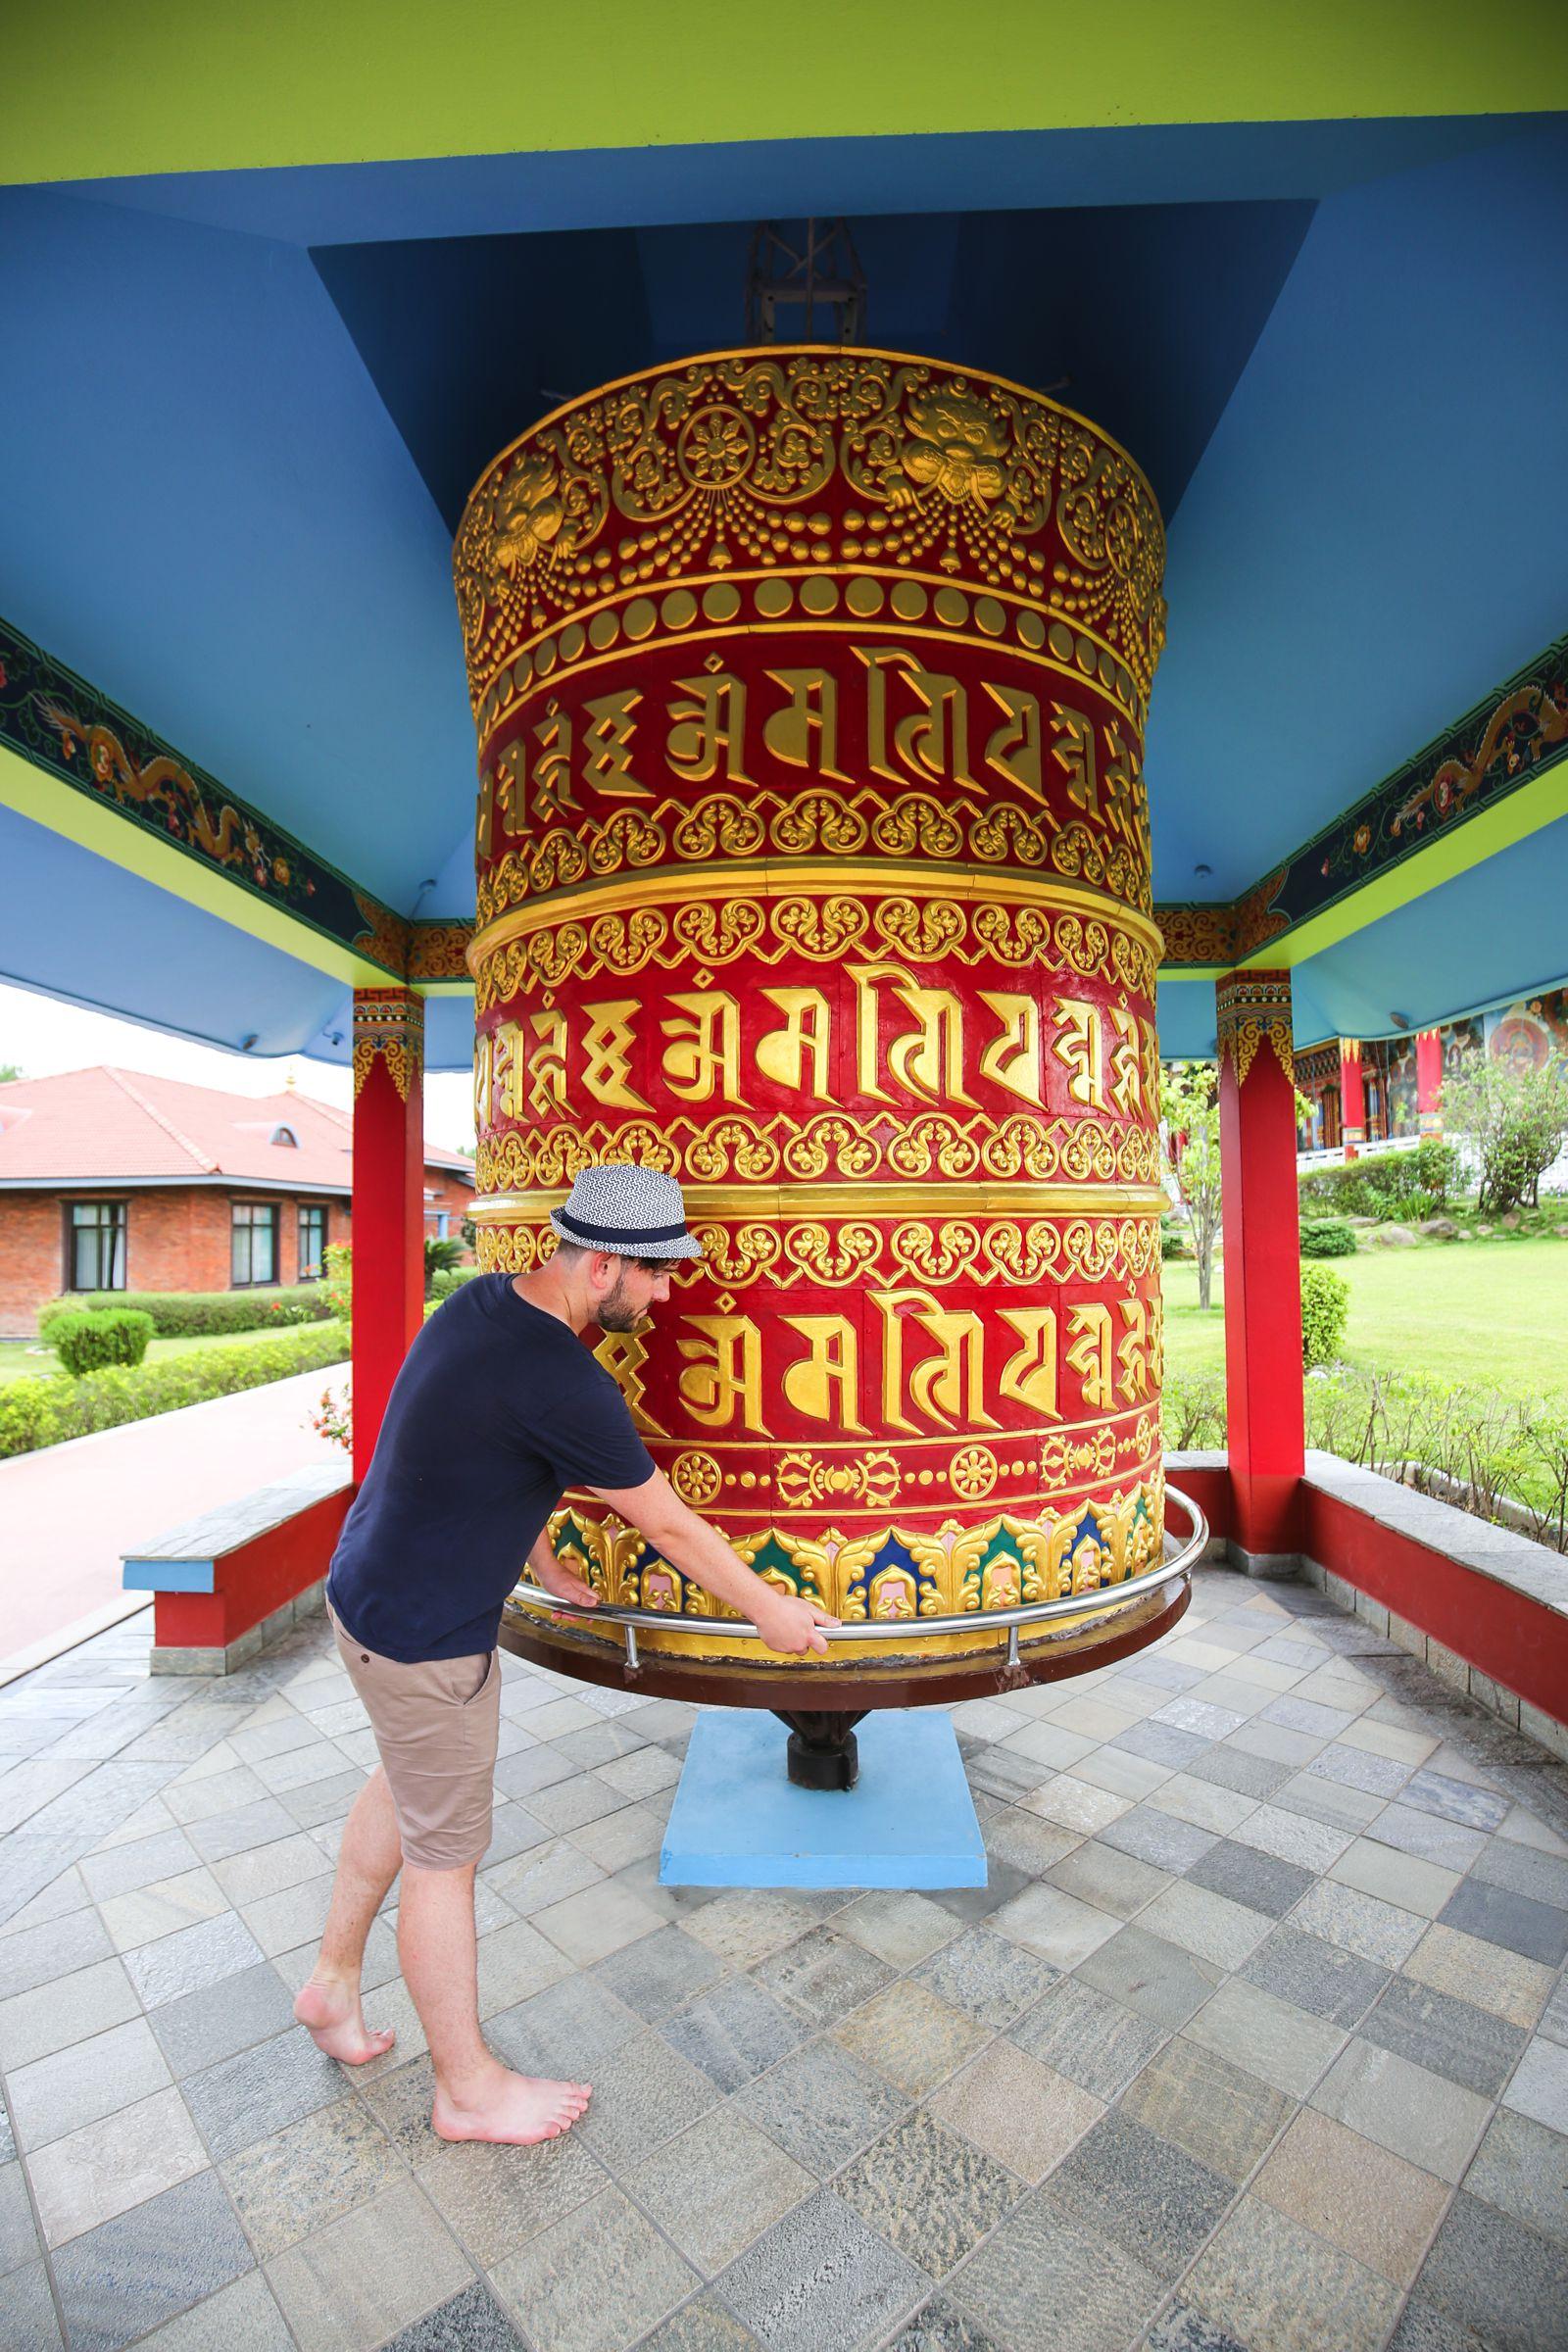 Photos And Postcards From Nepal... Chitwan, Kathmandu, Bhaktapur, Panauti, Pokhara, Tansen, Palpa, Lumbini (17)